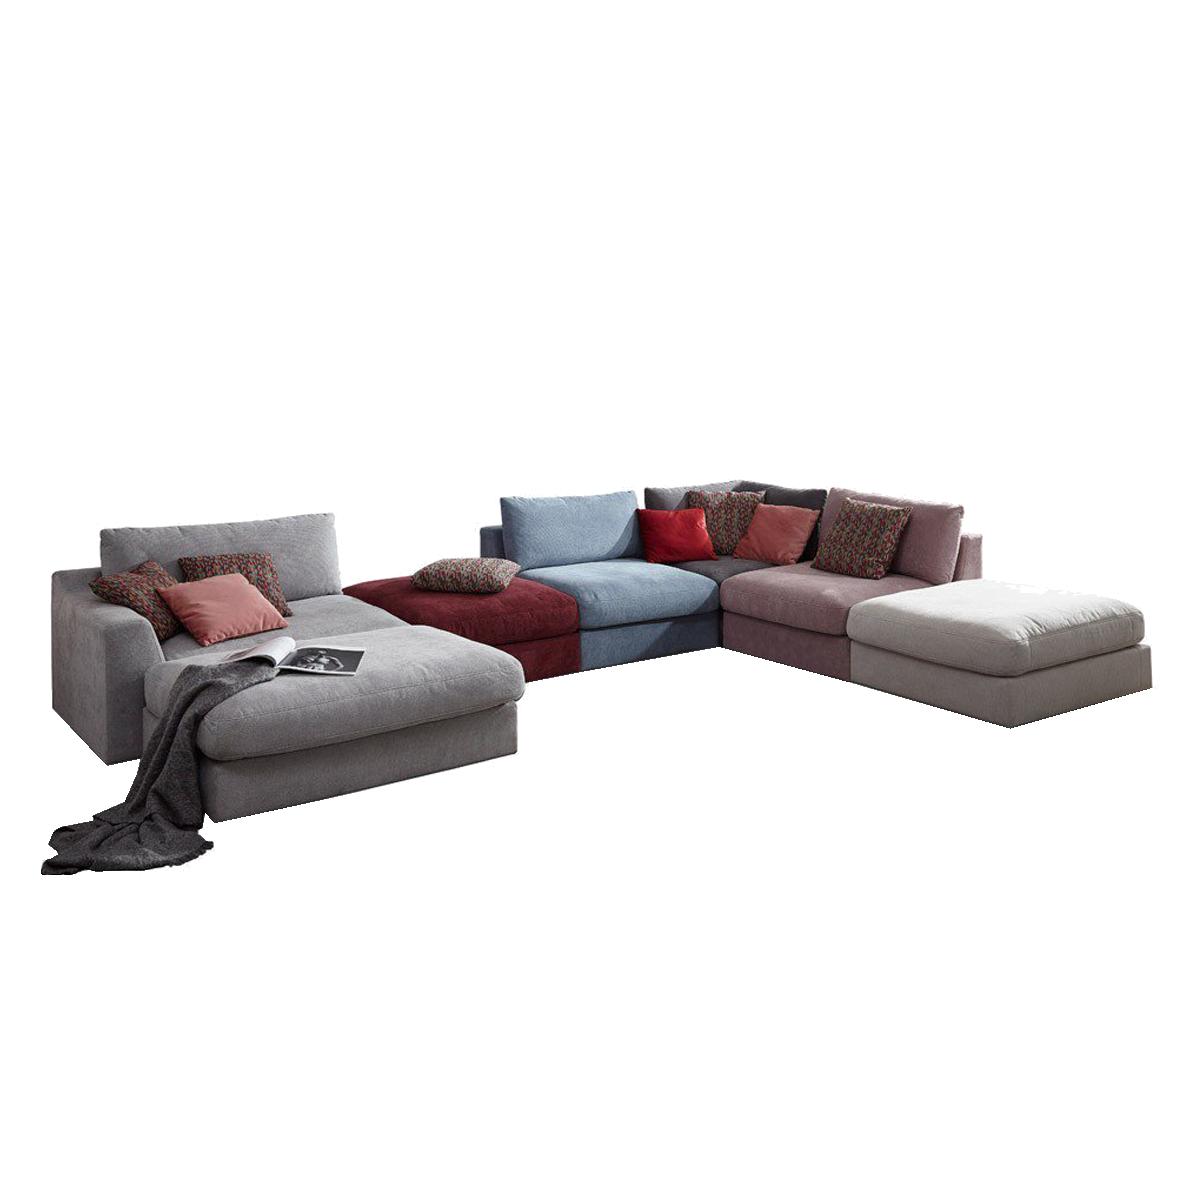 Full Size of Big Sofa Kaufen York Im Patchwork Stil Bezug In Verschiedene Farben Whlbar Kolonialstil überzug Modernes Echtleder Höffner Günstig Garnitur Freistil Sofa Big Sofa Kaufen